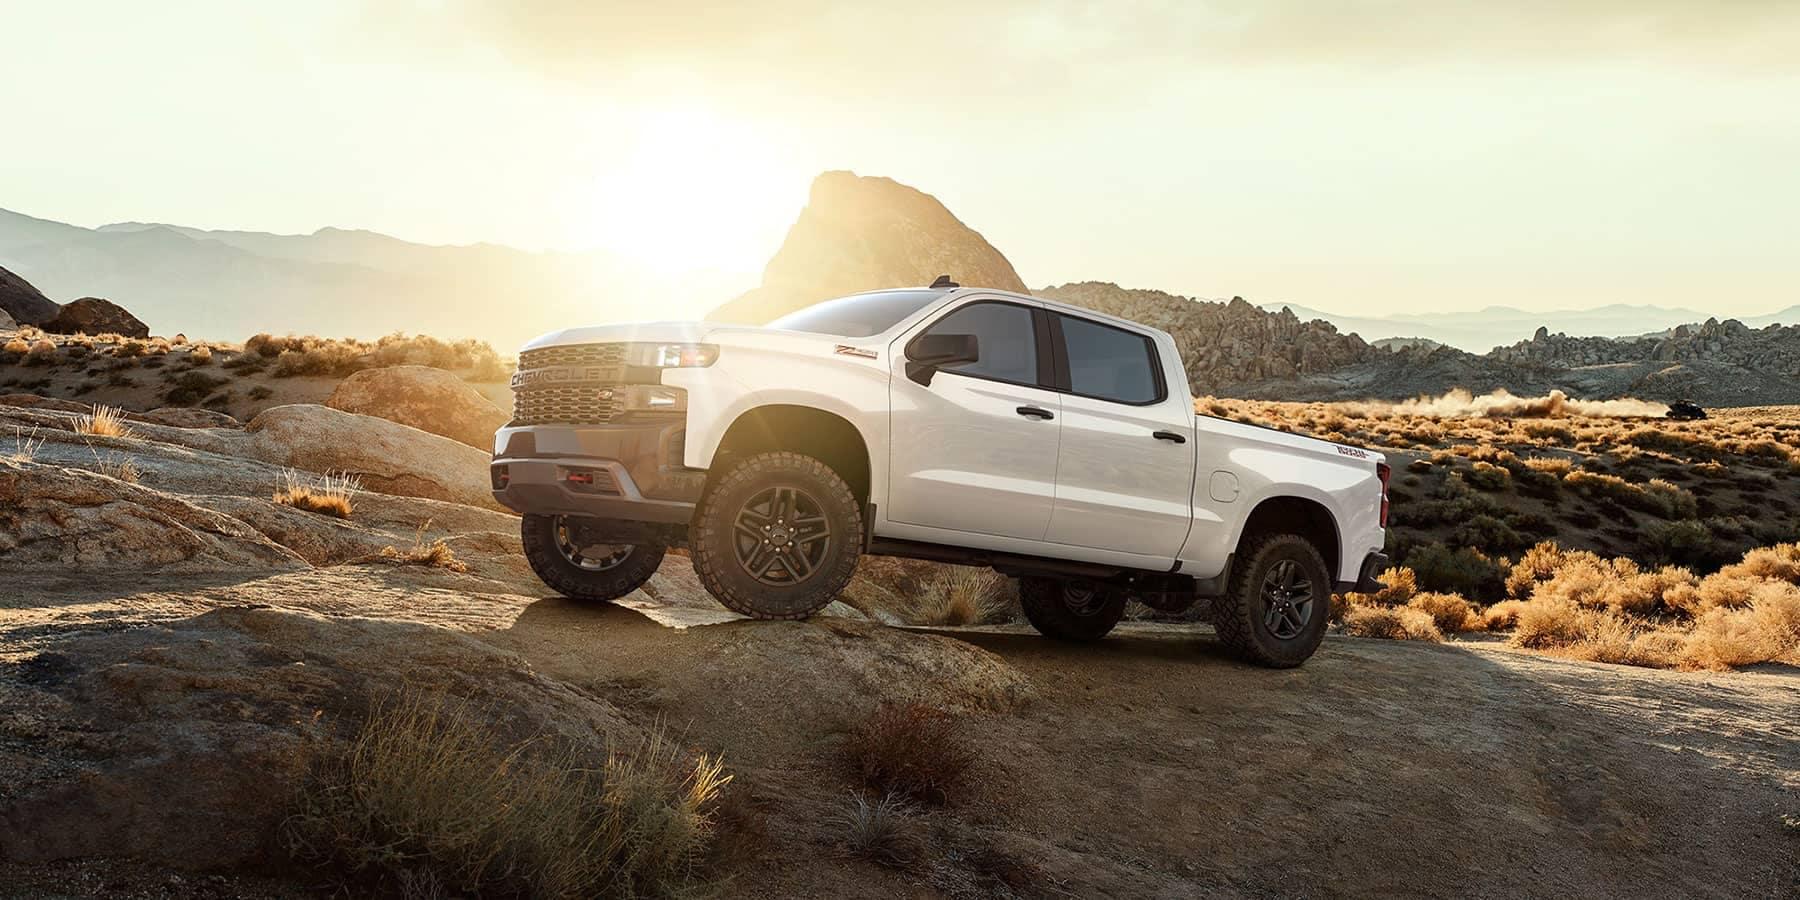 2019-Chevrolet-Silverado-In-The-Desert